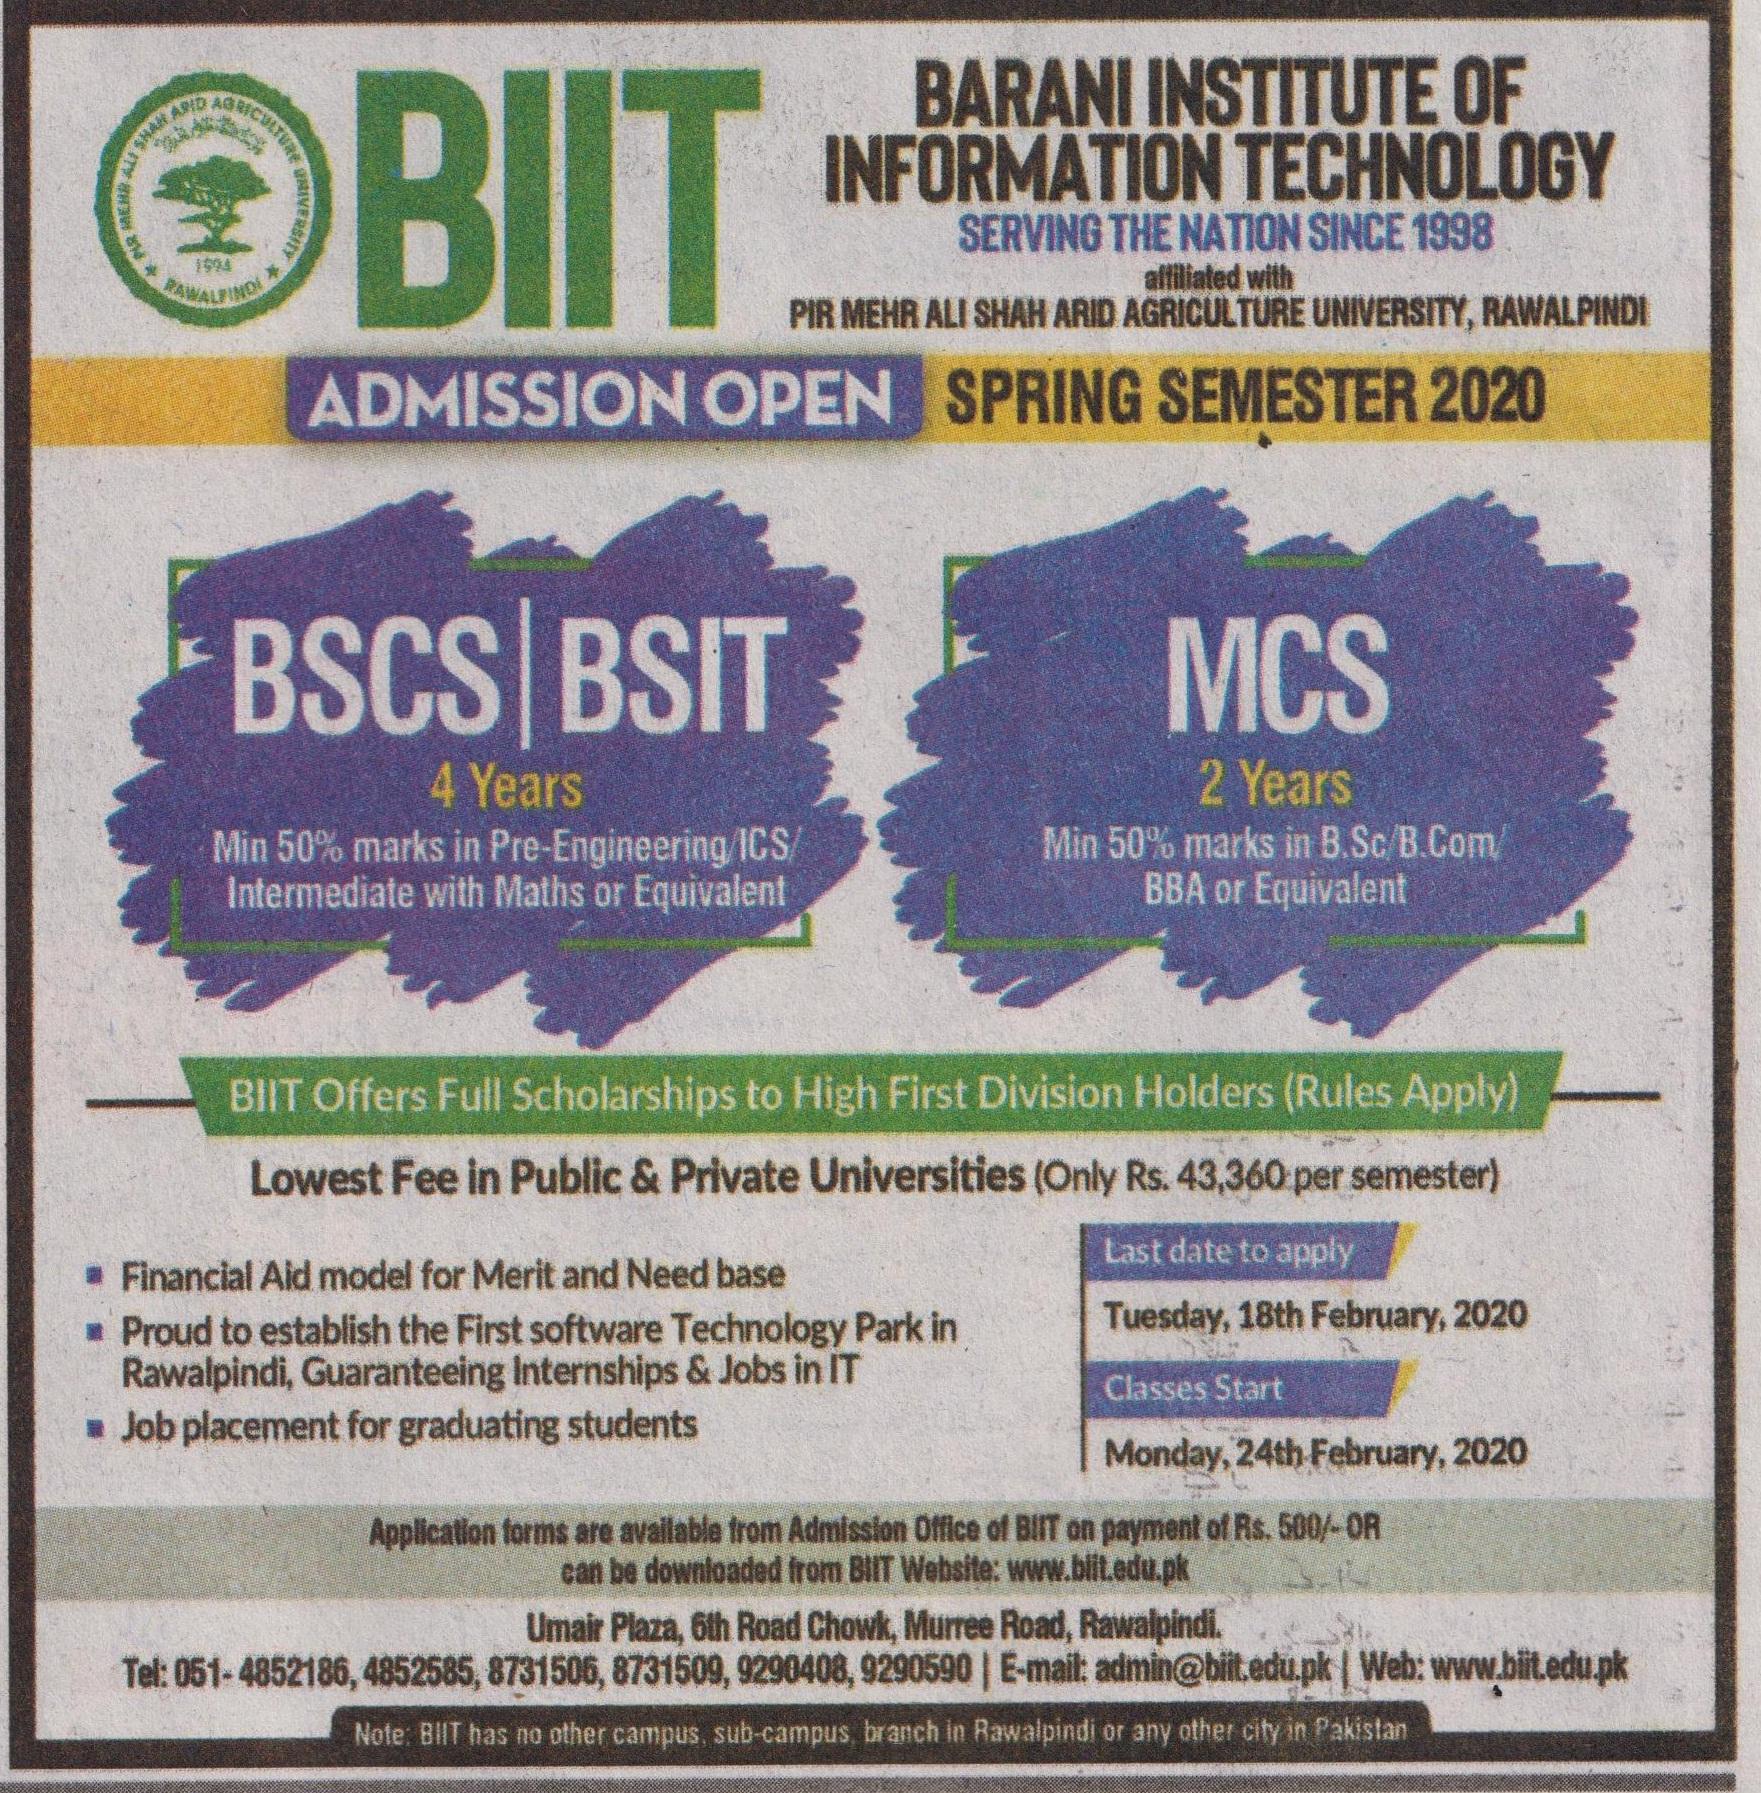 Barani Institute Of Information Technology Rawalpindi Admissions